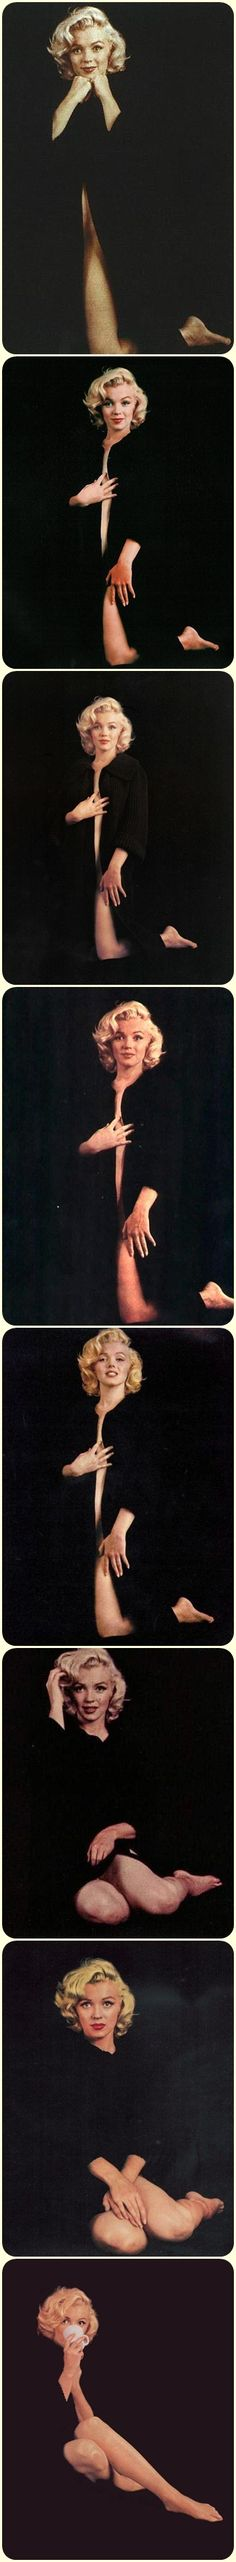 Marilyn. Black cardigan sitting. Photos by Milton Greene, 1953.